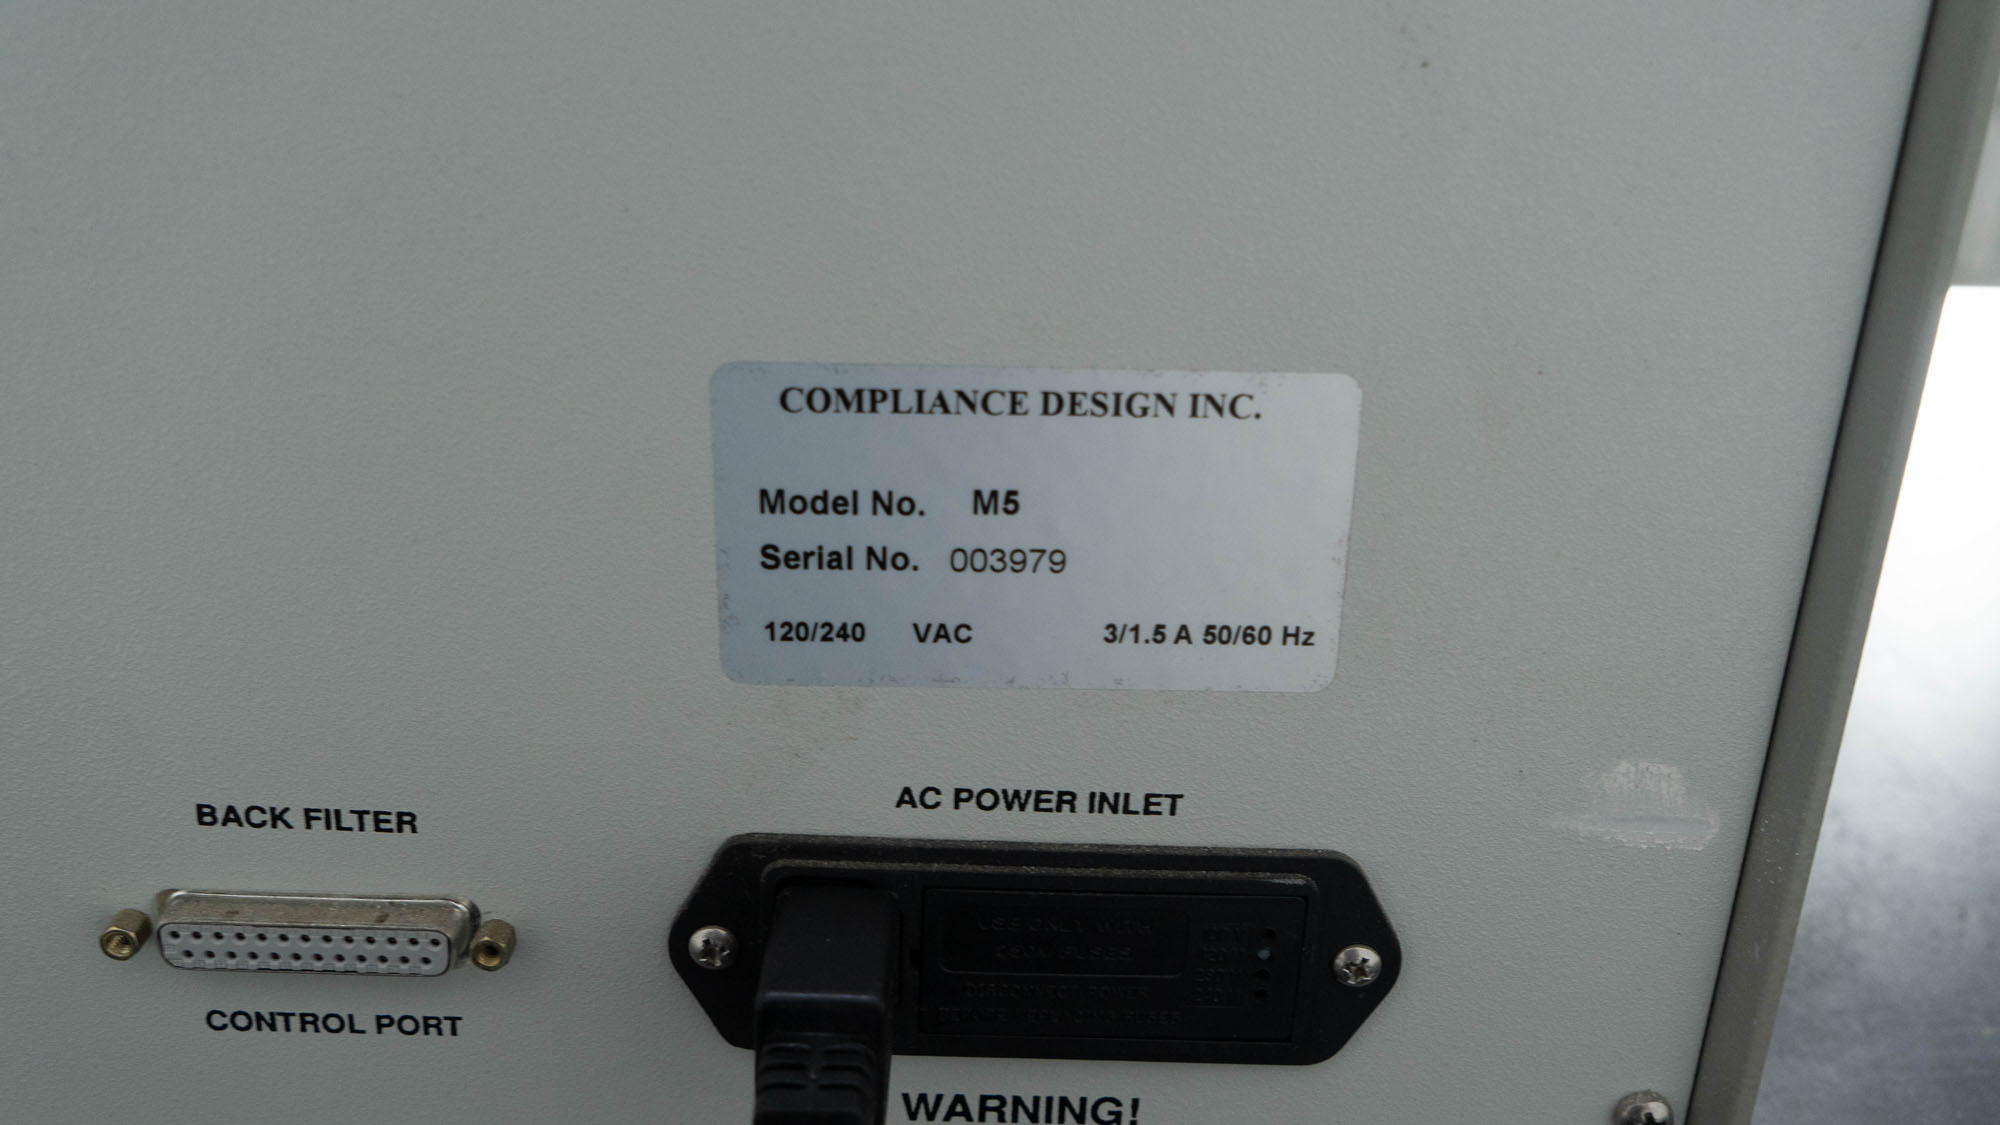 Compliance Design Universeral Surge Generator, Model M5